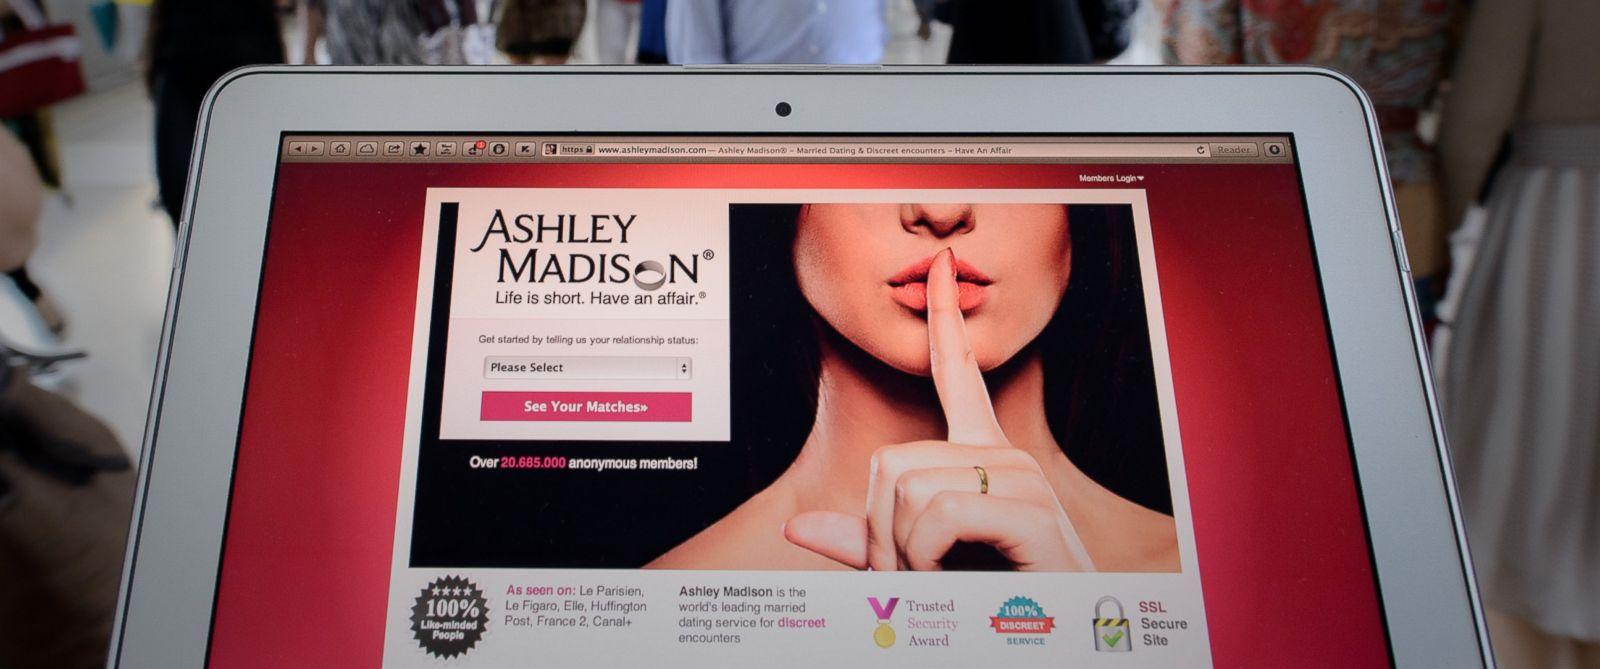 Online dating sites ashley madison